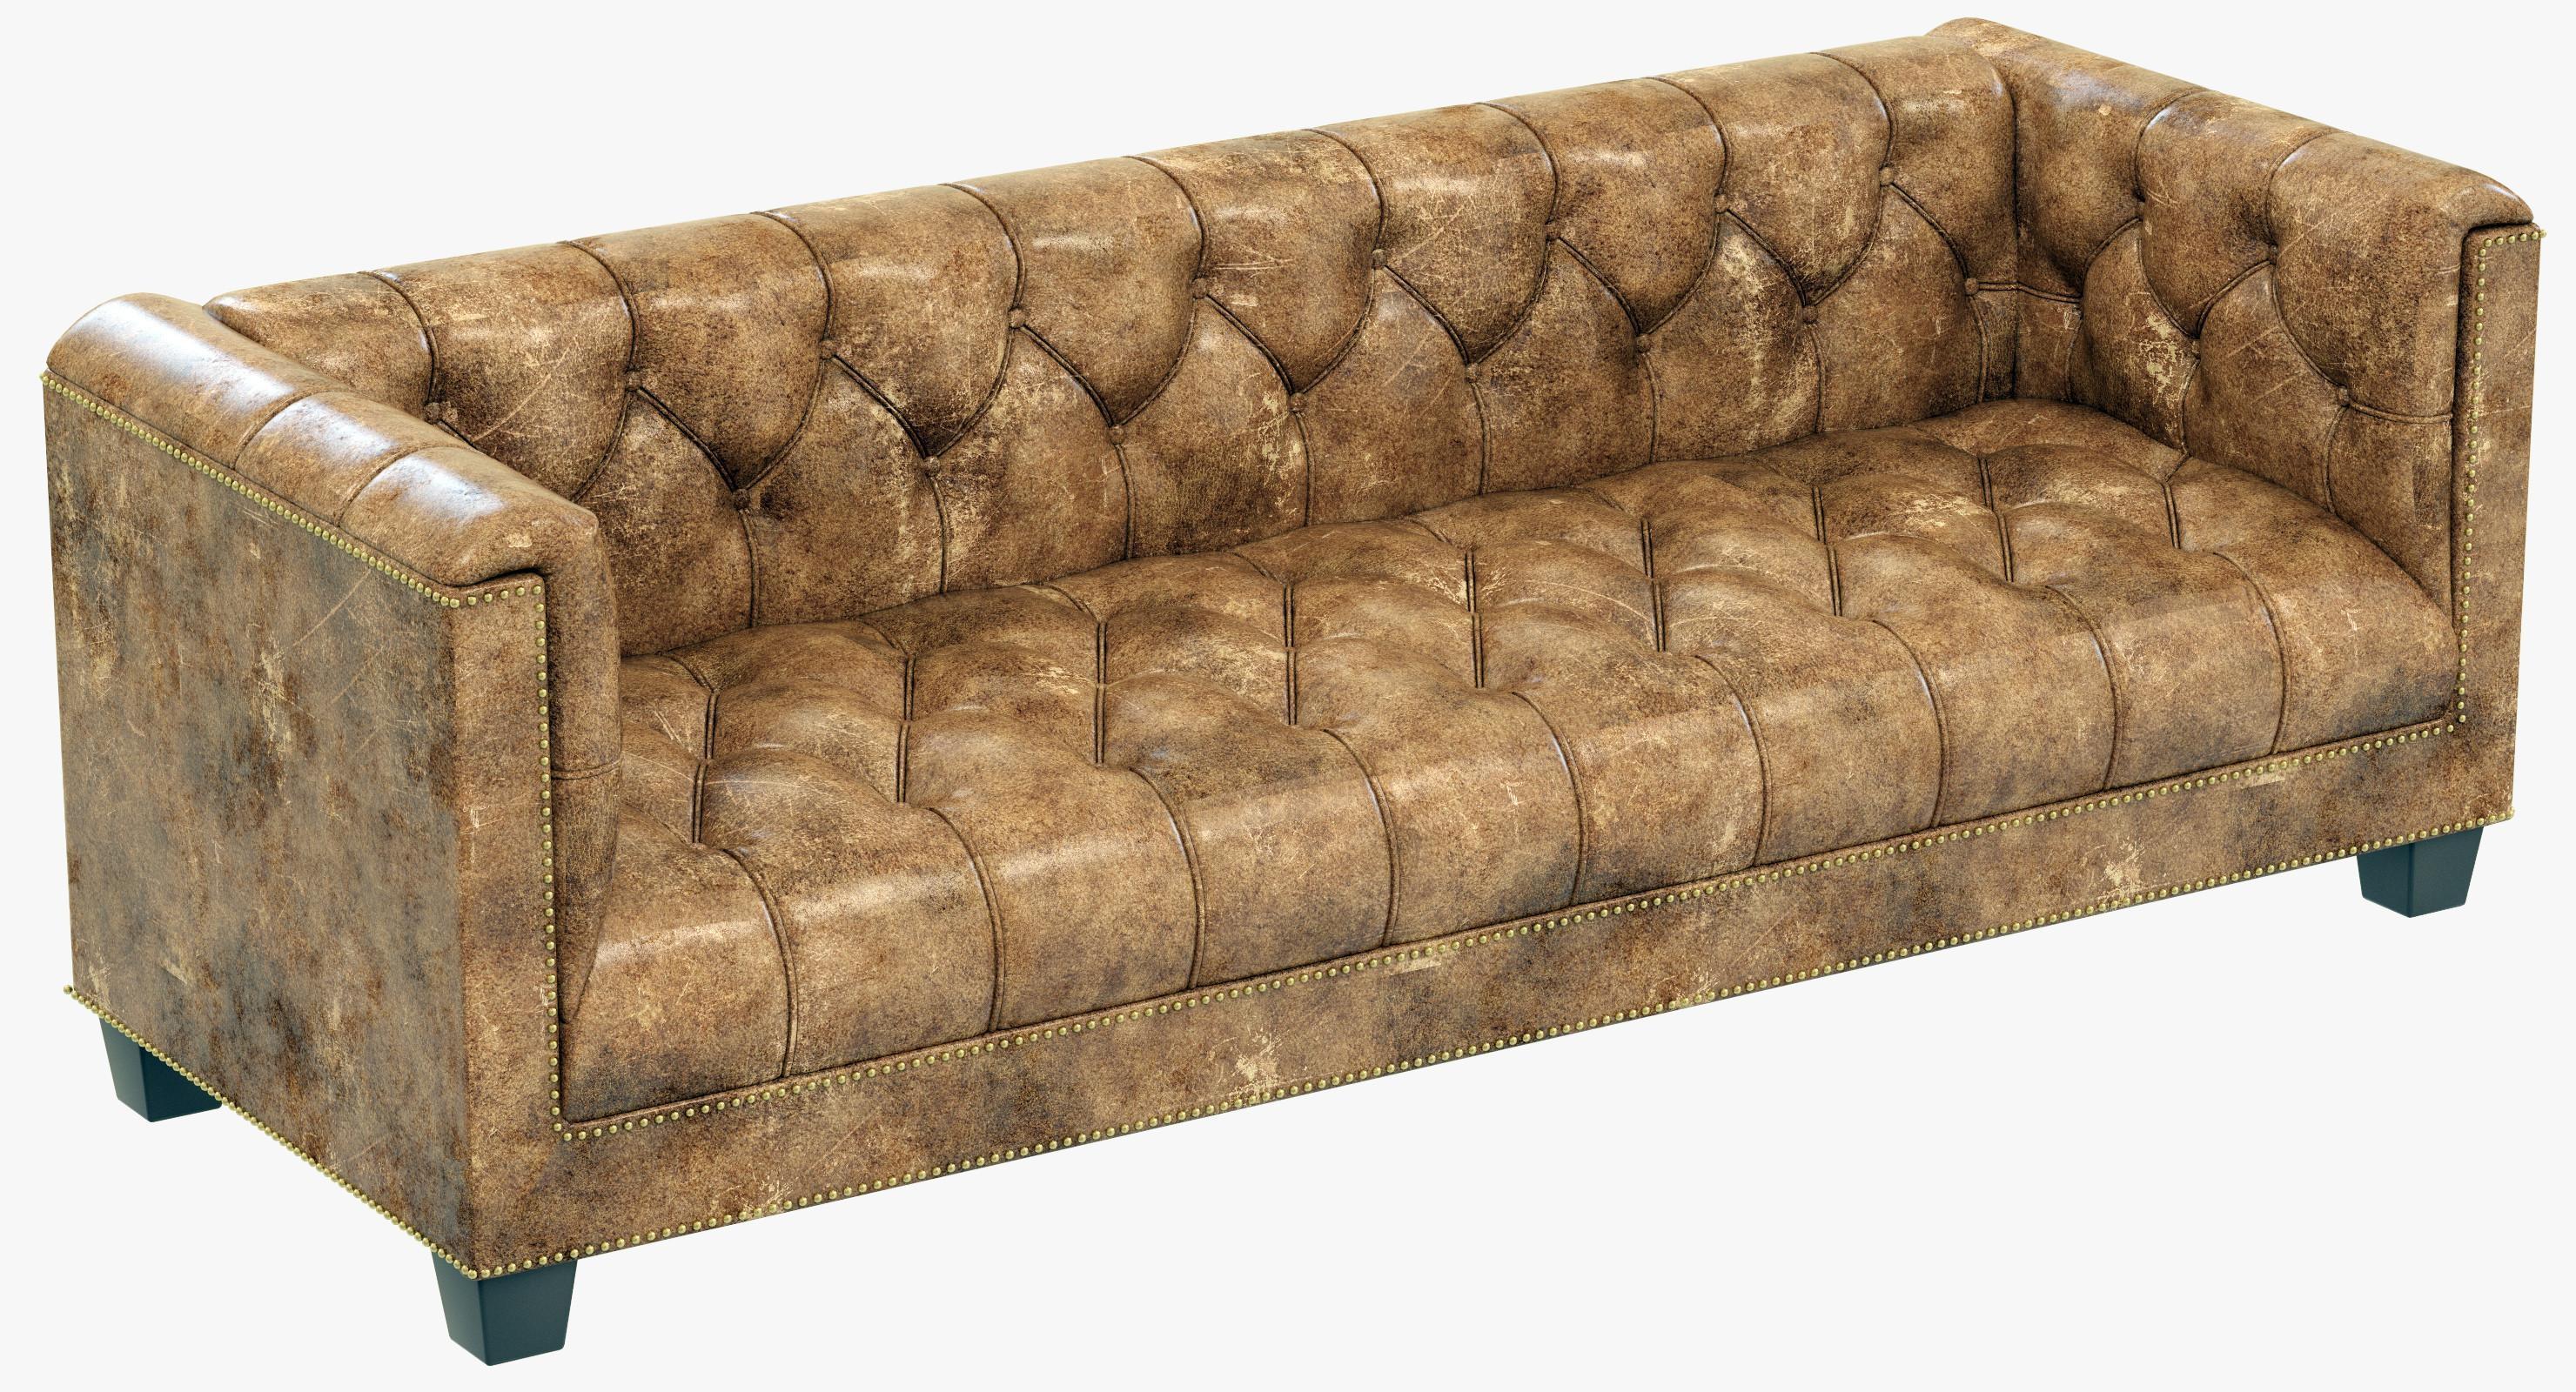 6 39 Savoy Sofa 3D Model Restoration Hardware Savoy Modern Sofa in Savoy Leather Sofas